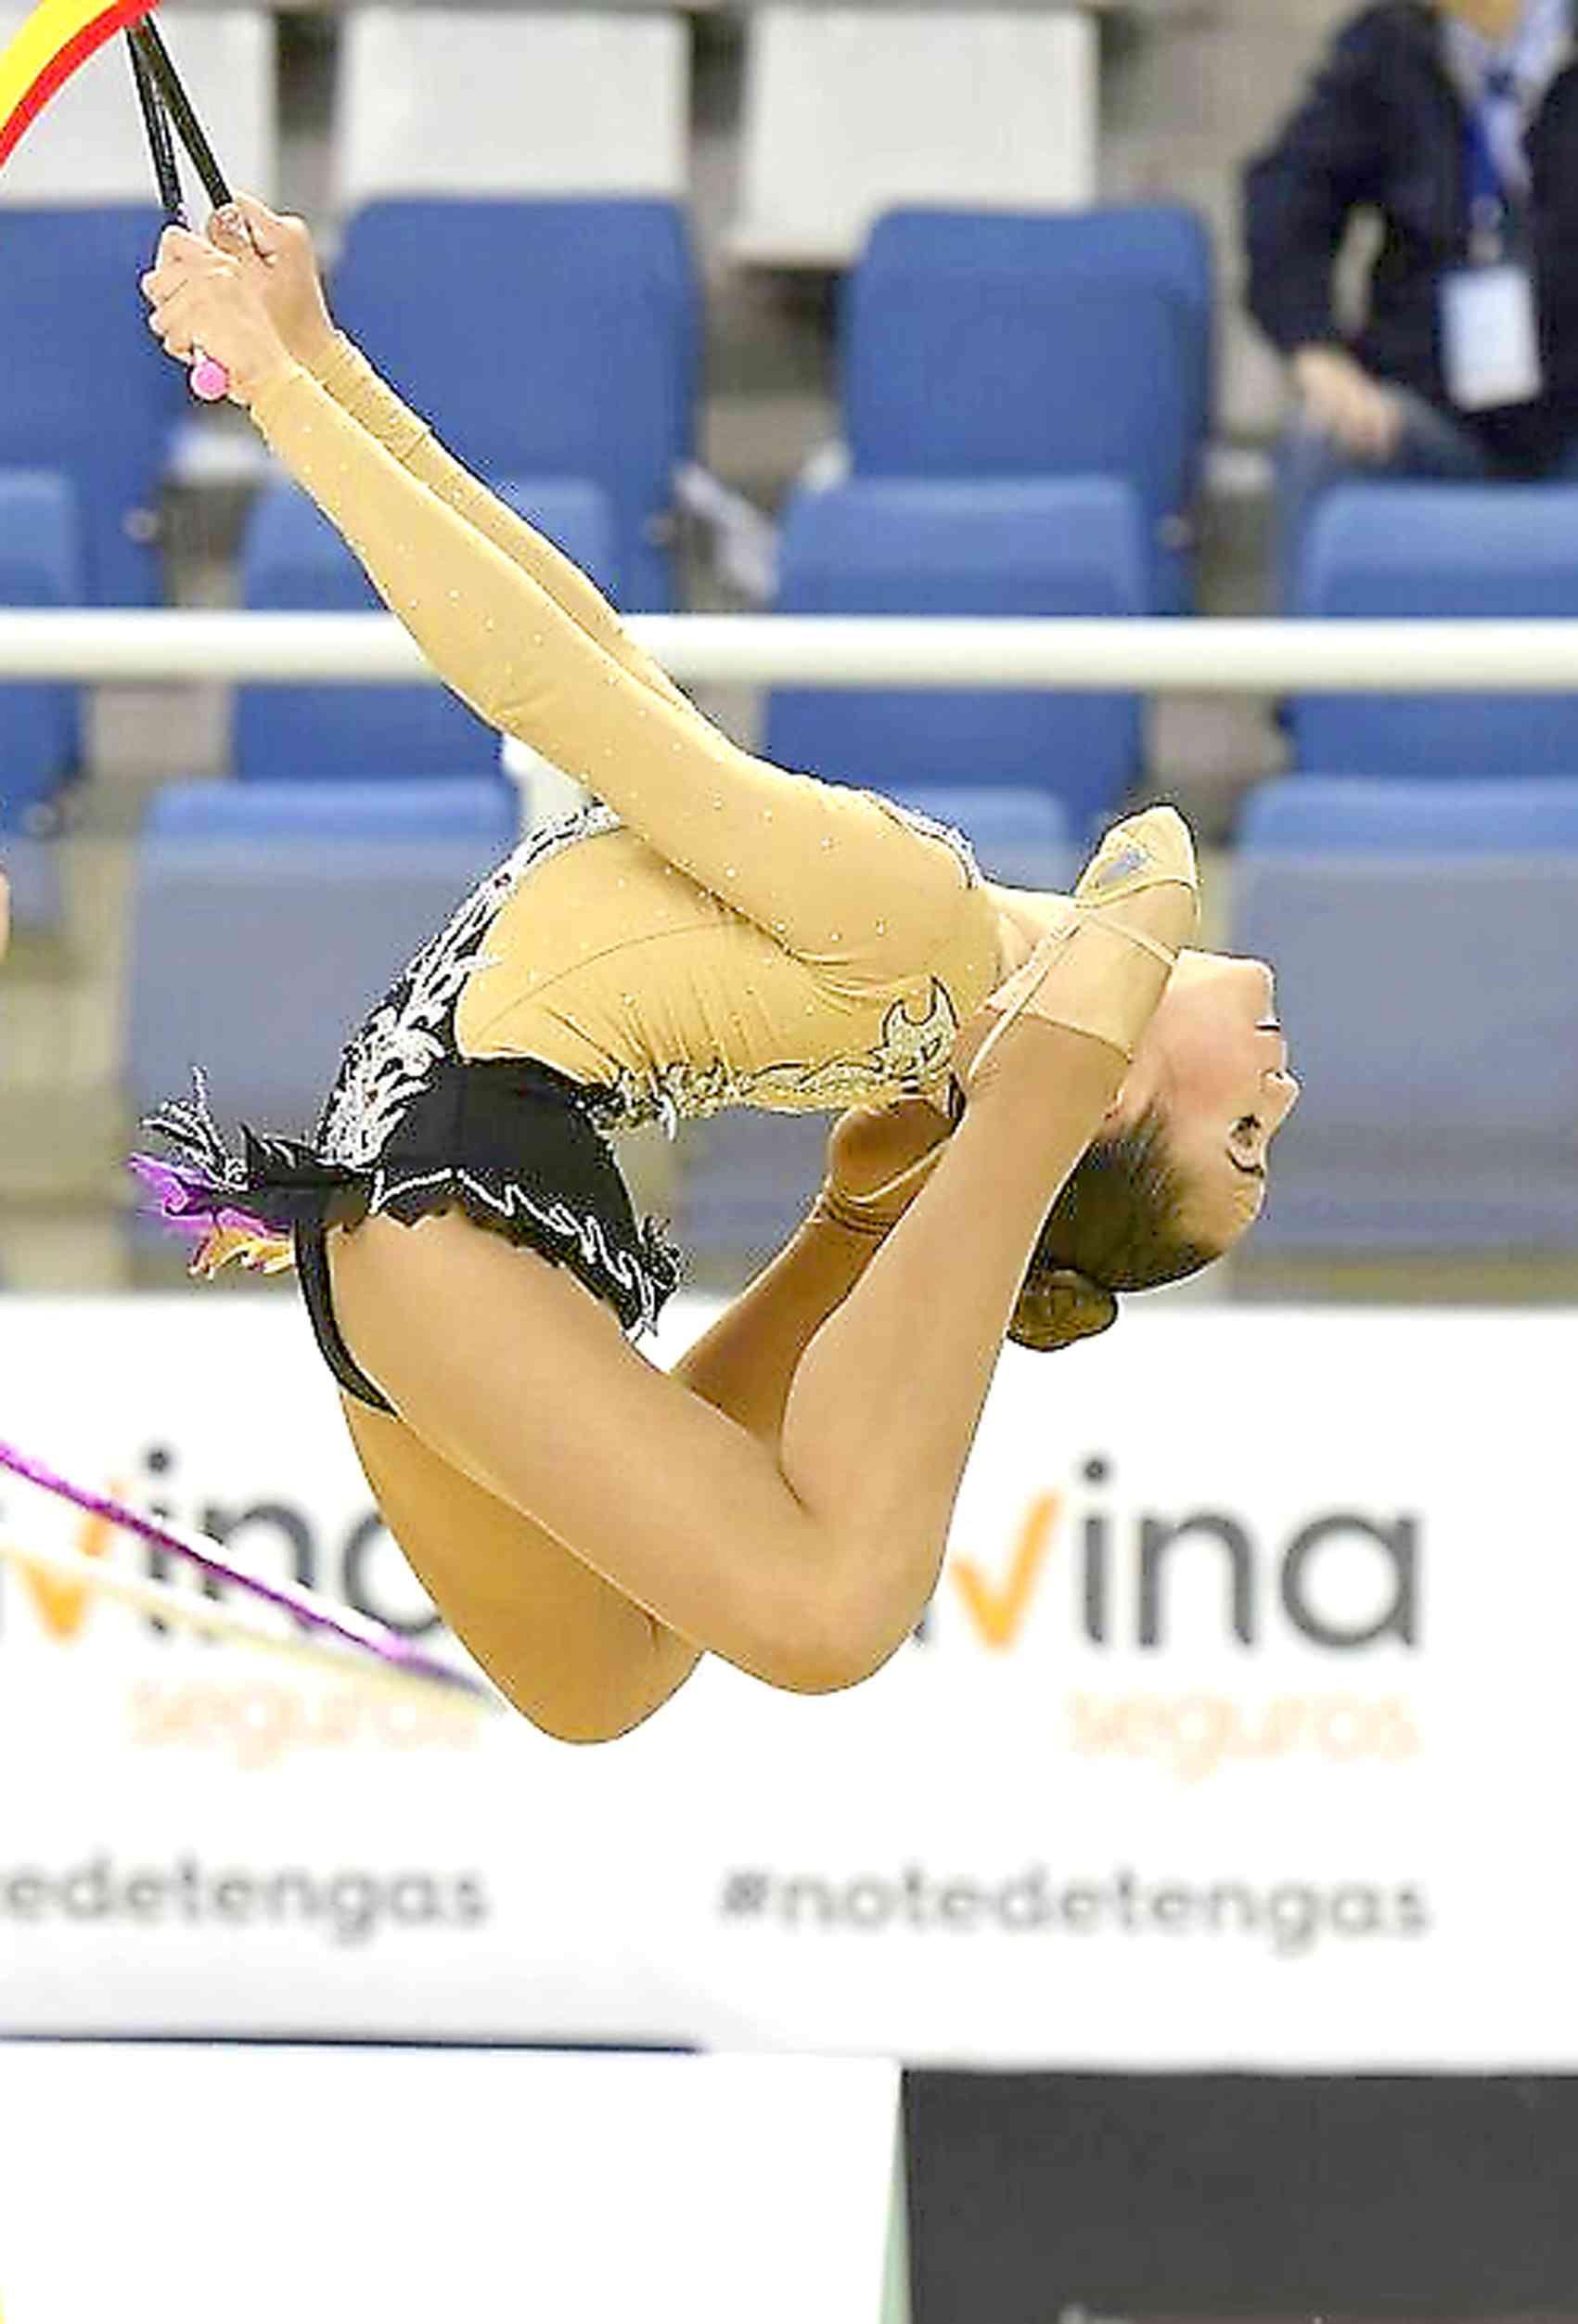 La gimnasta ibense Carla Valero, tercera en el Campeonato Nacional Base